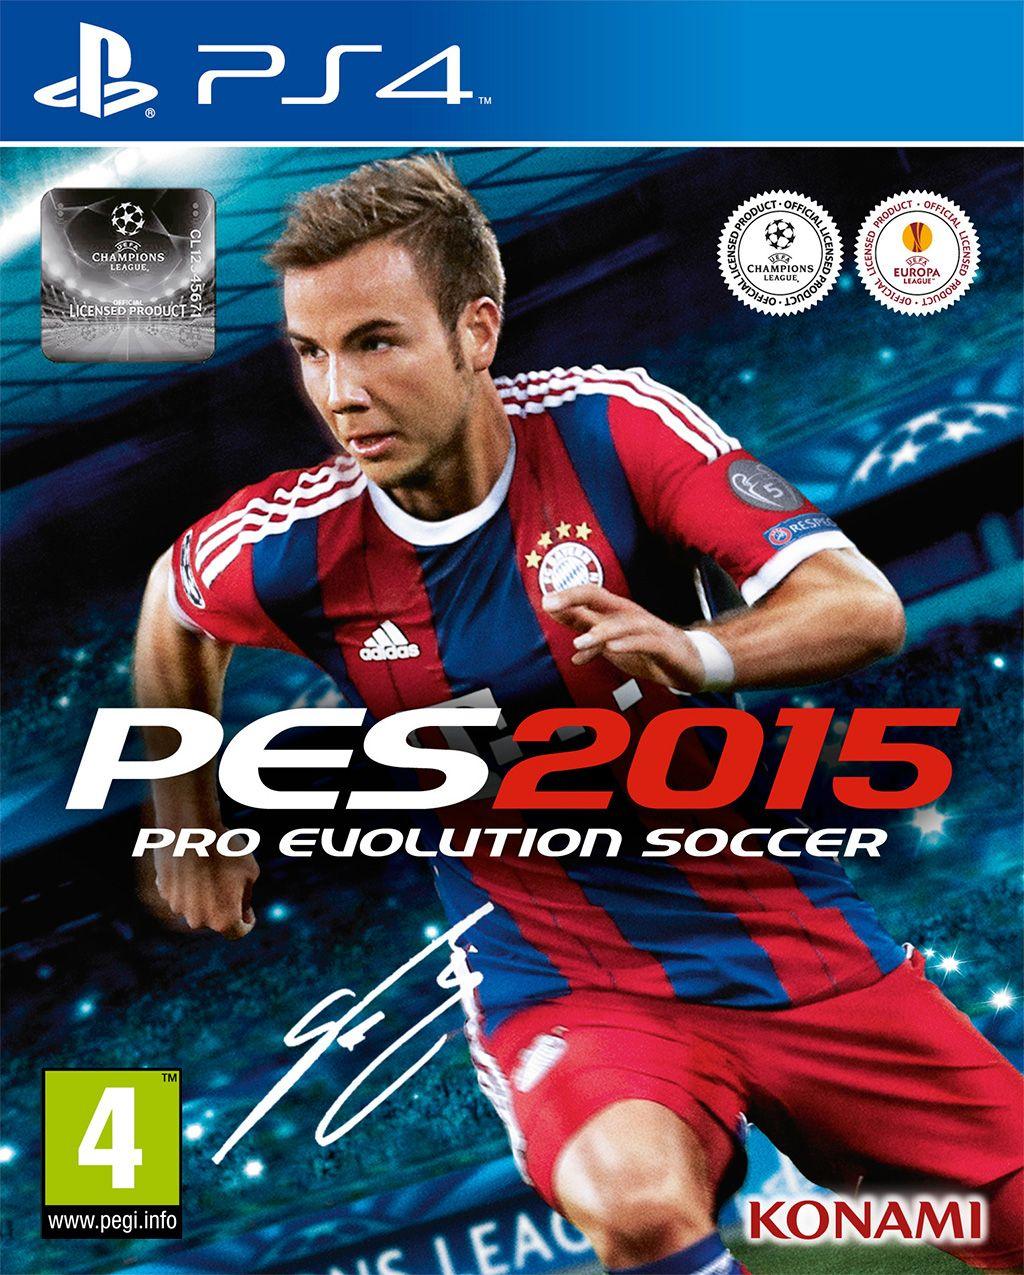 PS4 Pro Evolution Soccer 2015